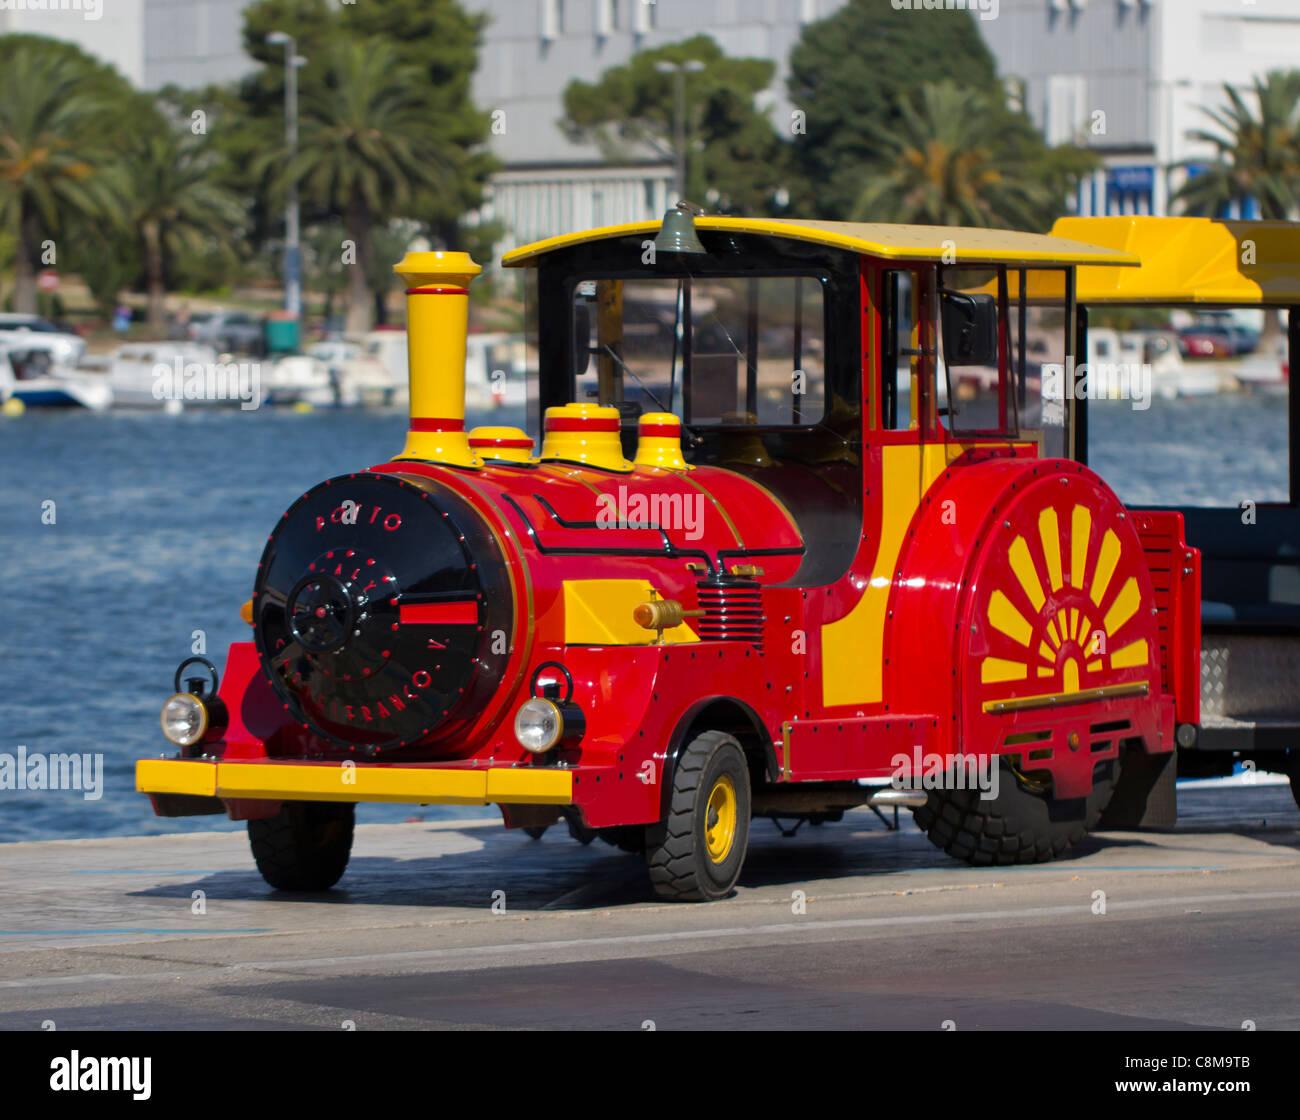 Small city train - Stock Image